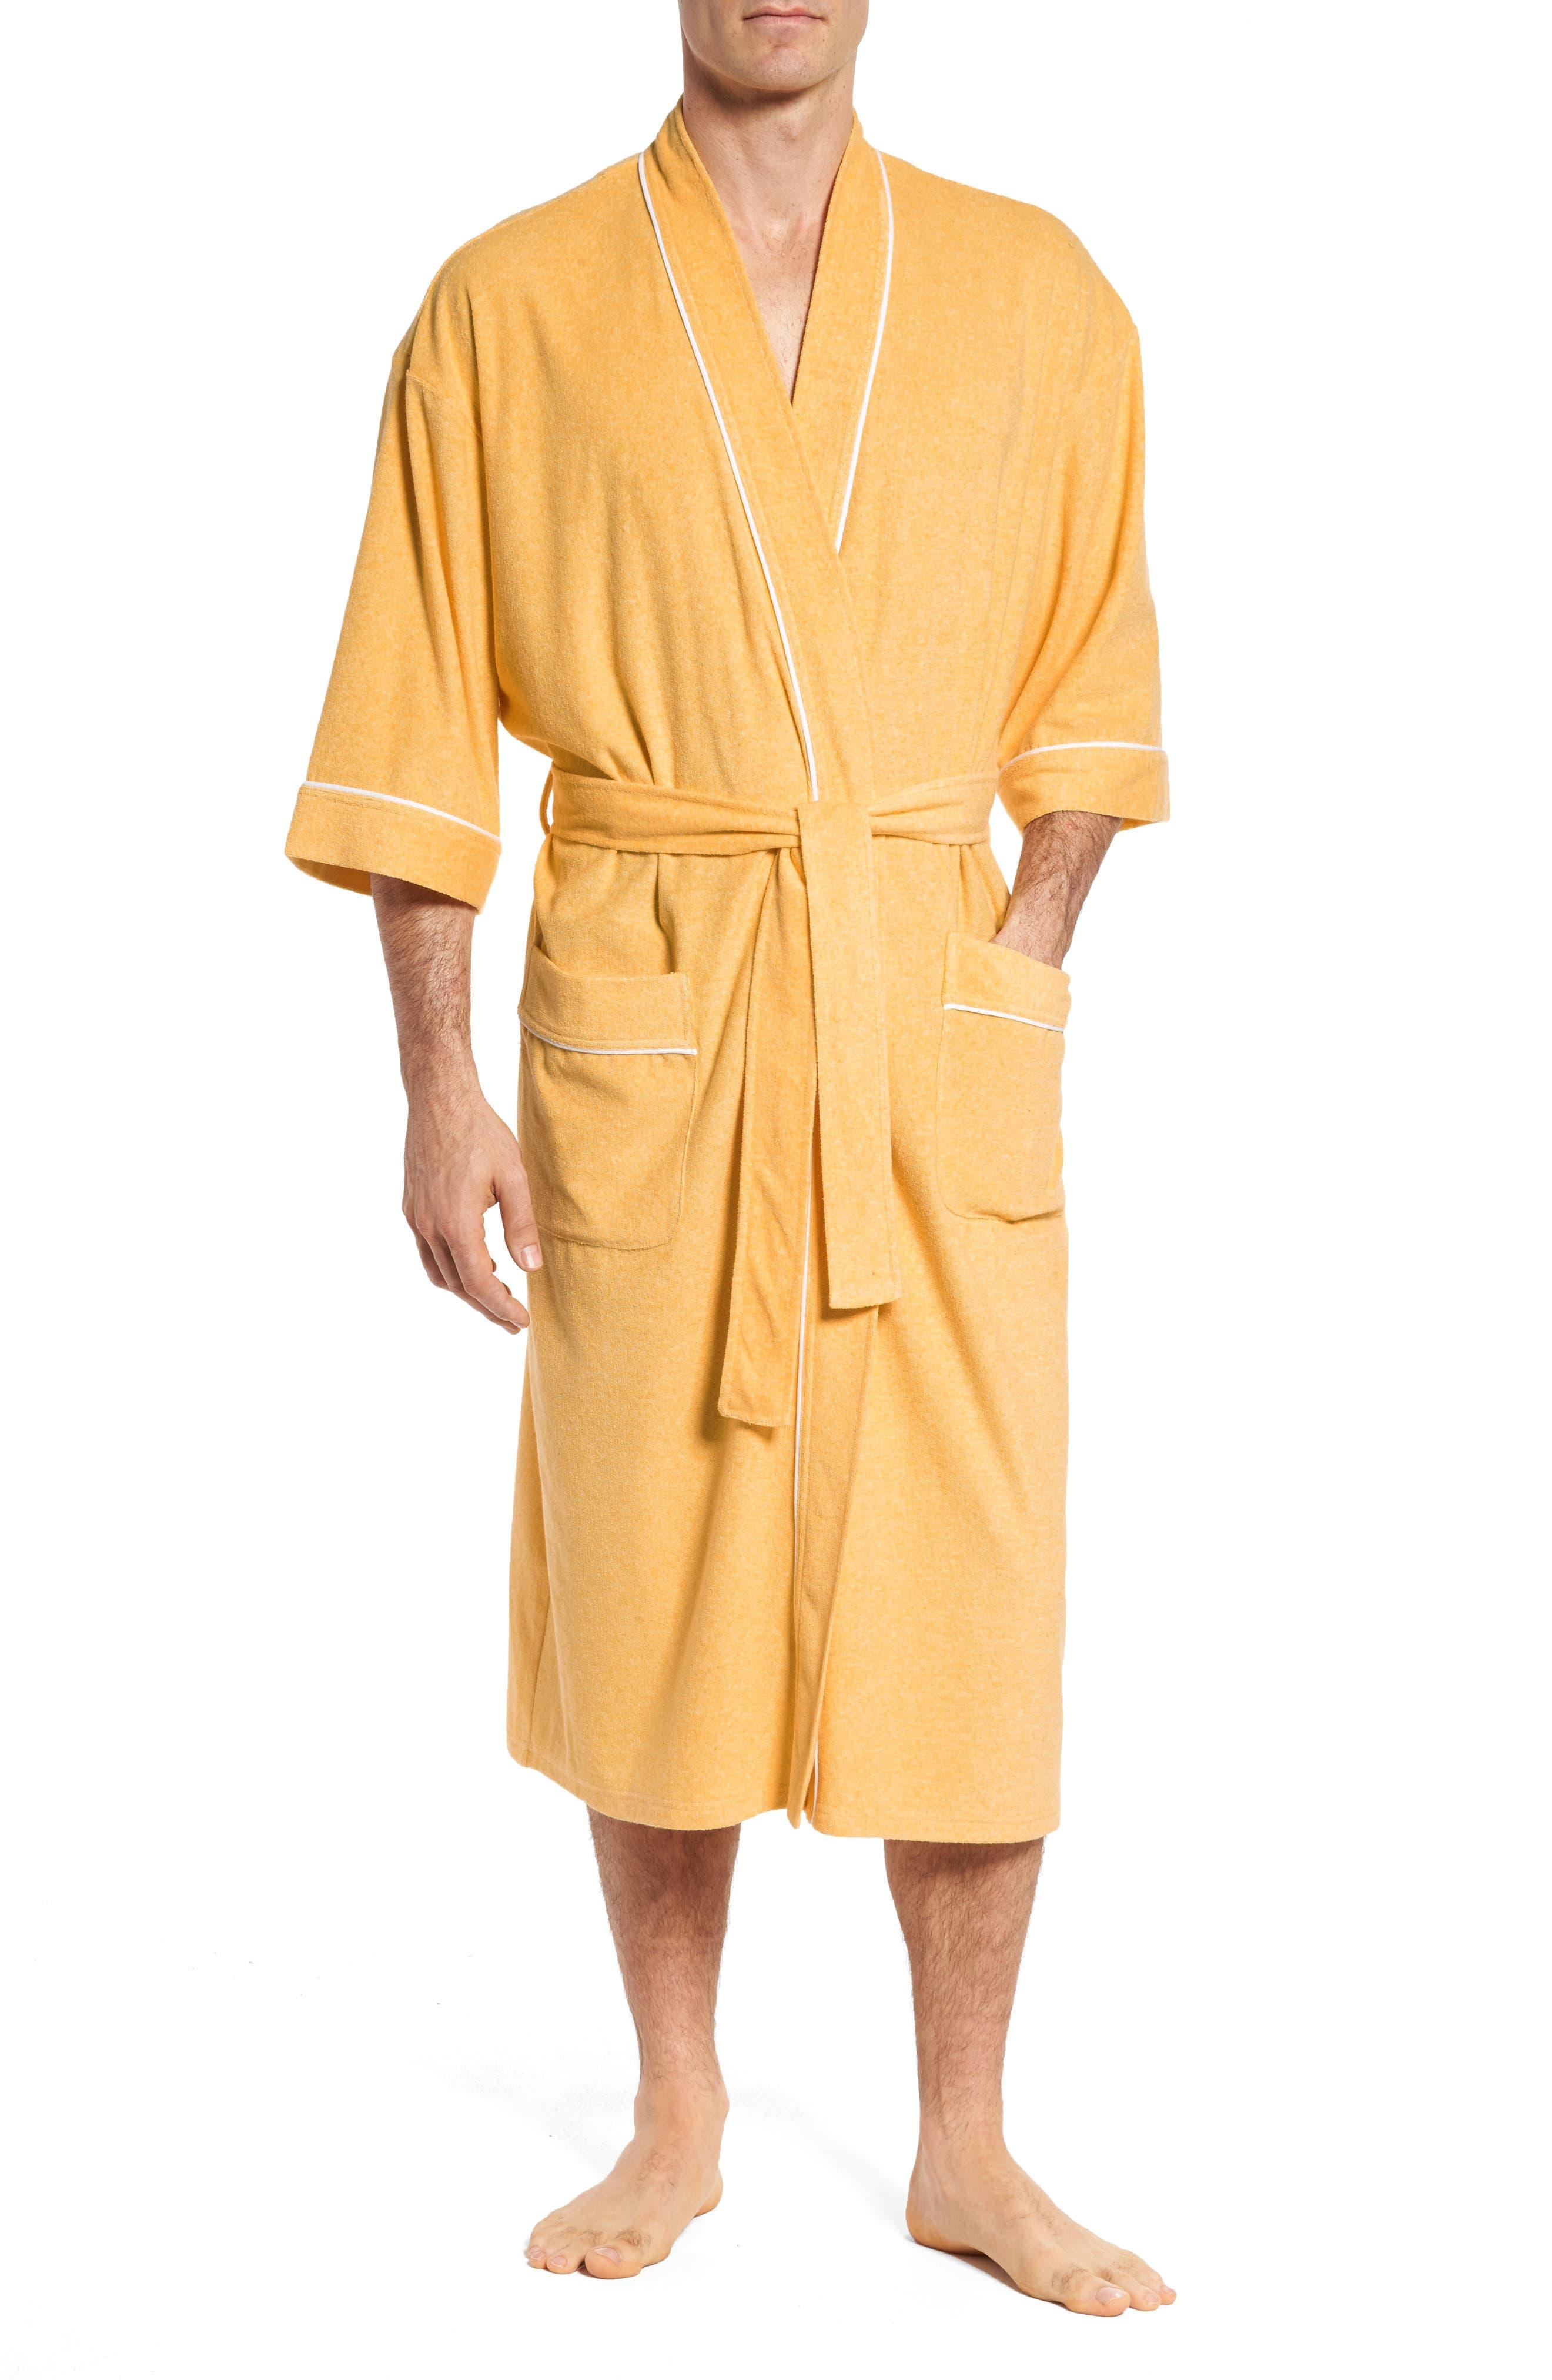 Kimono Cotton Blend Robe,                             Main thumbnail 1, color,                             700